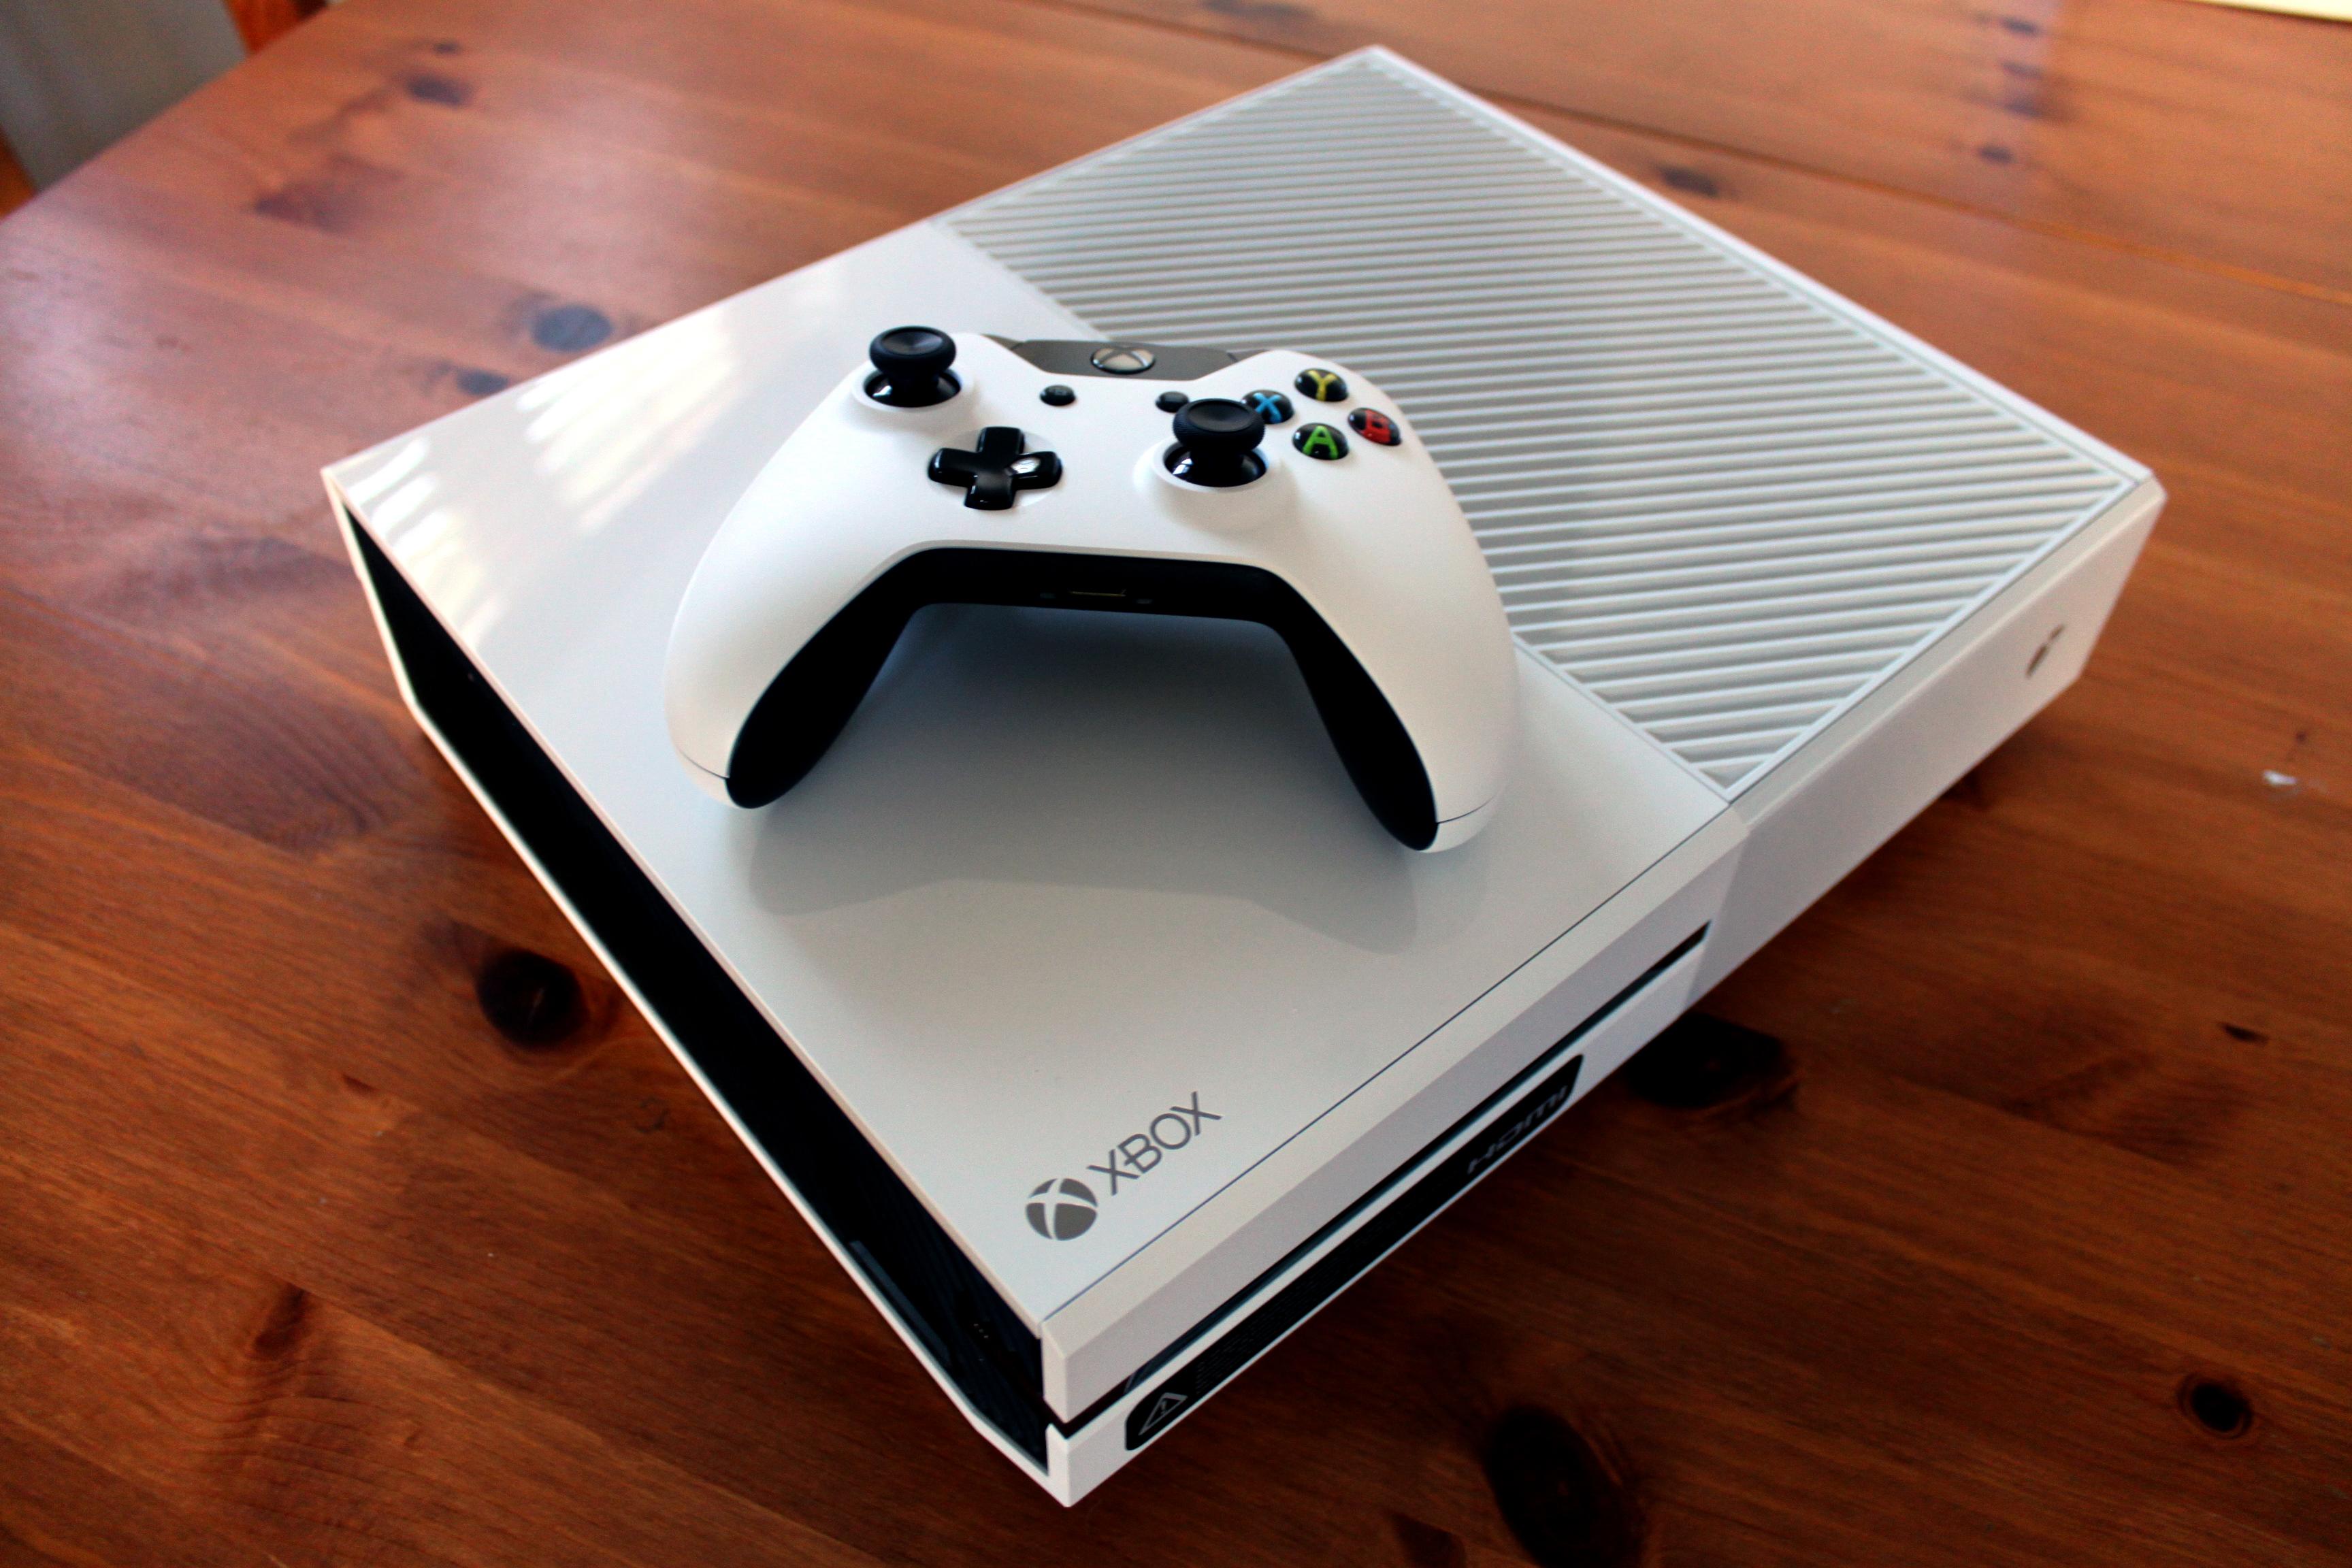 Xbox One | nicholasjparr Xbox One White Console Sunset Overdrive